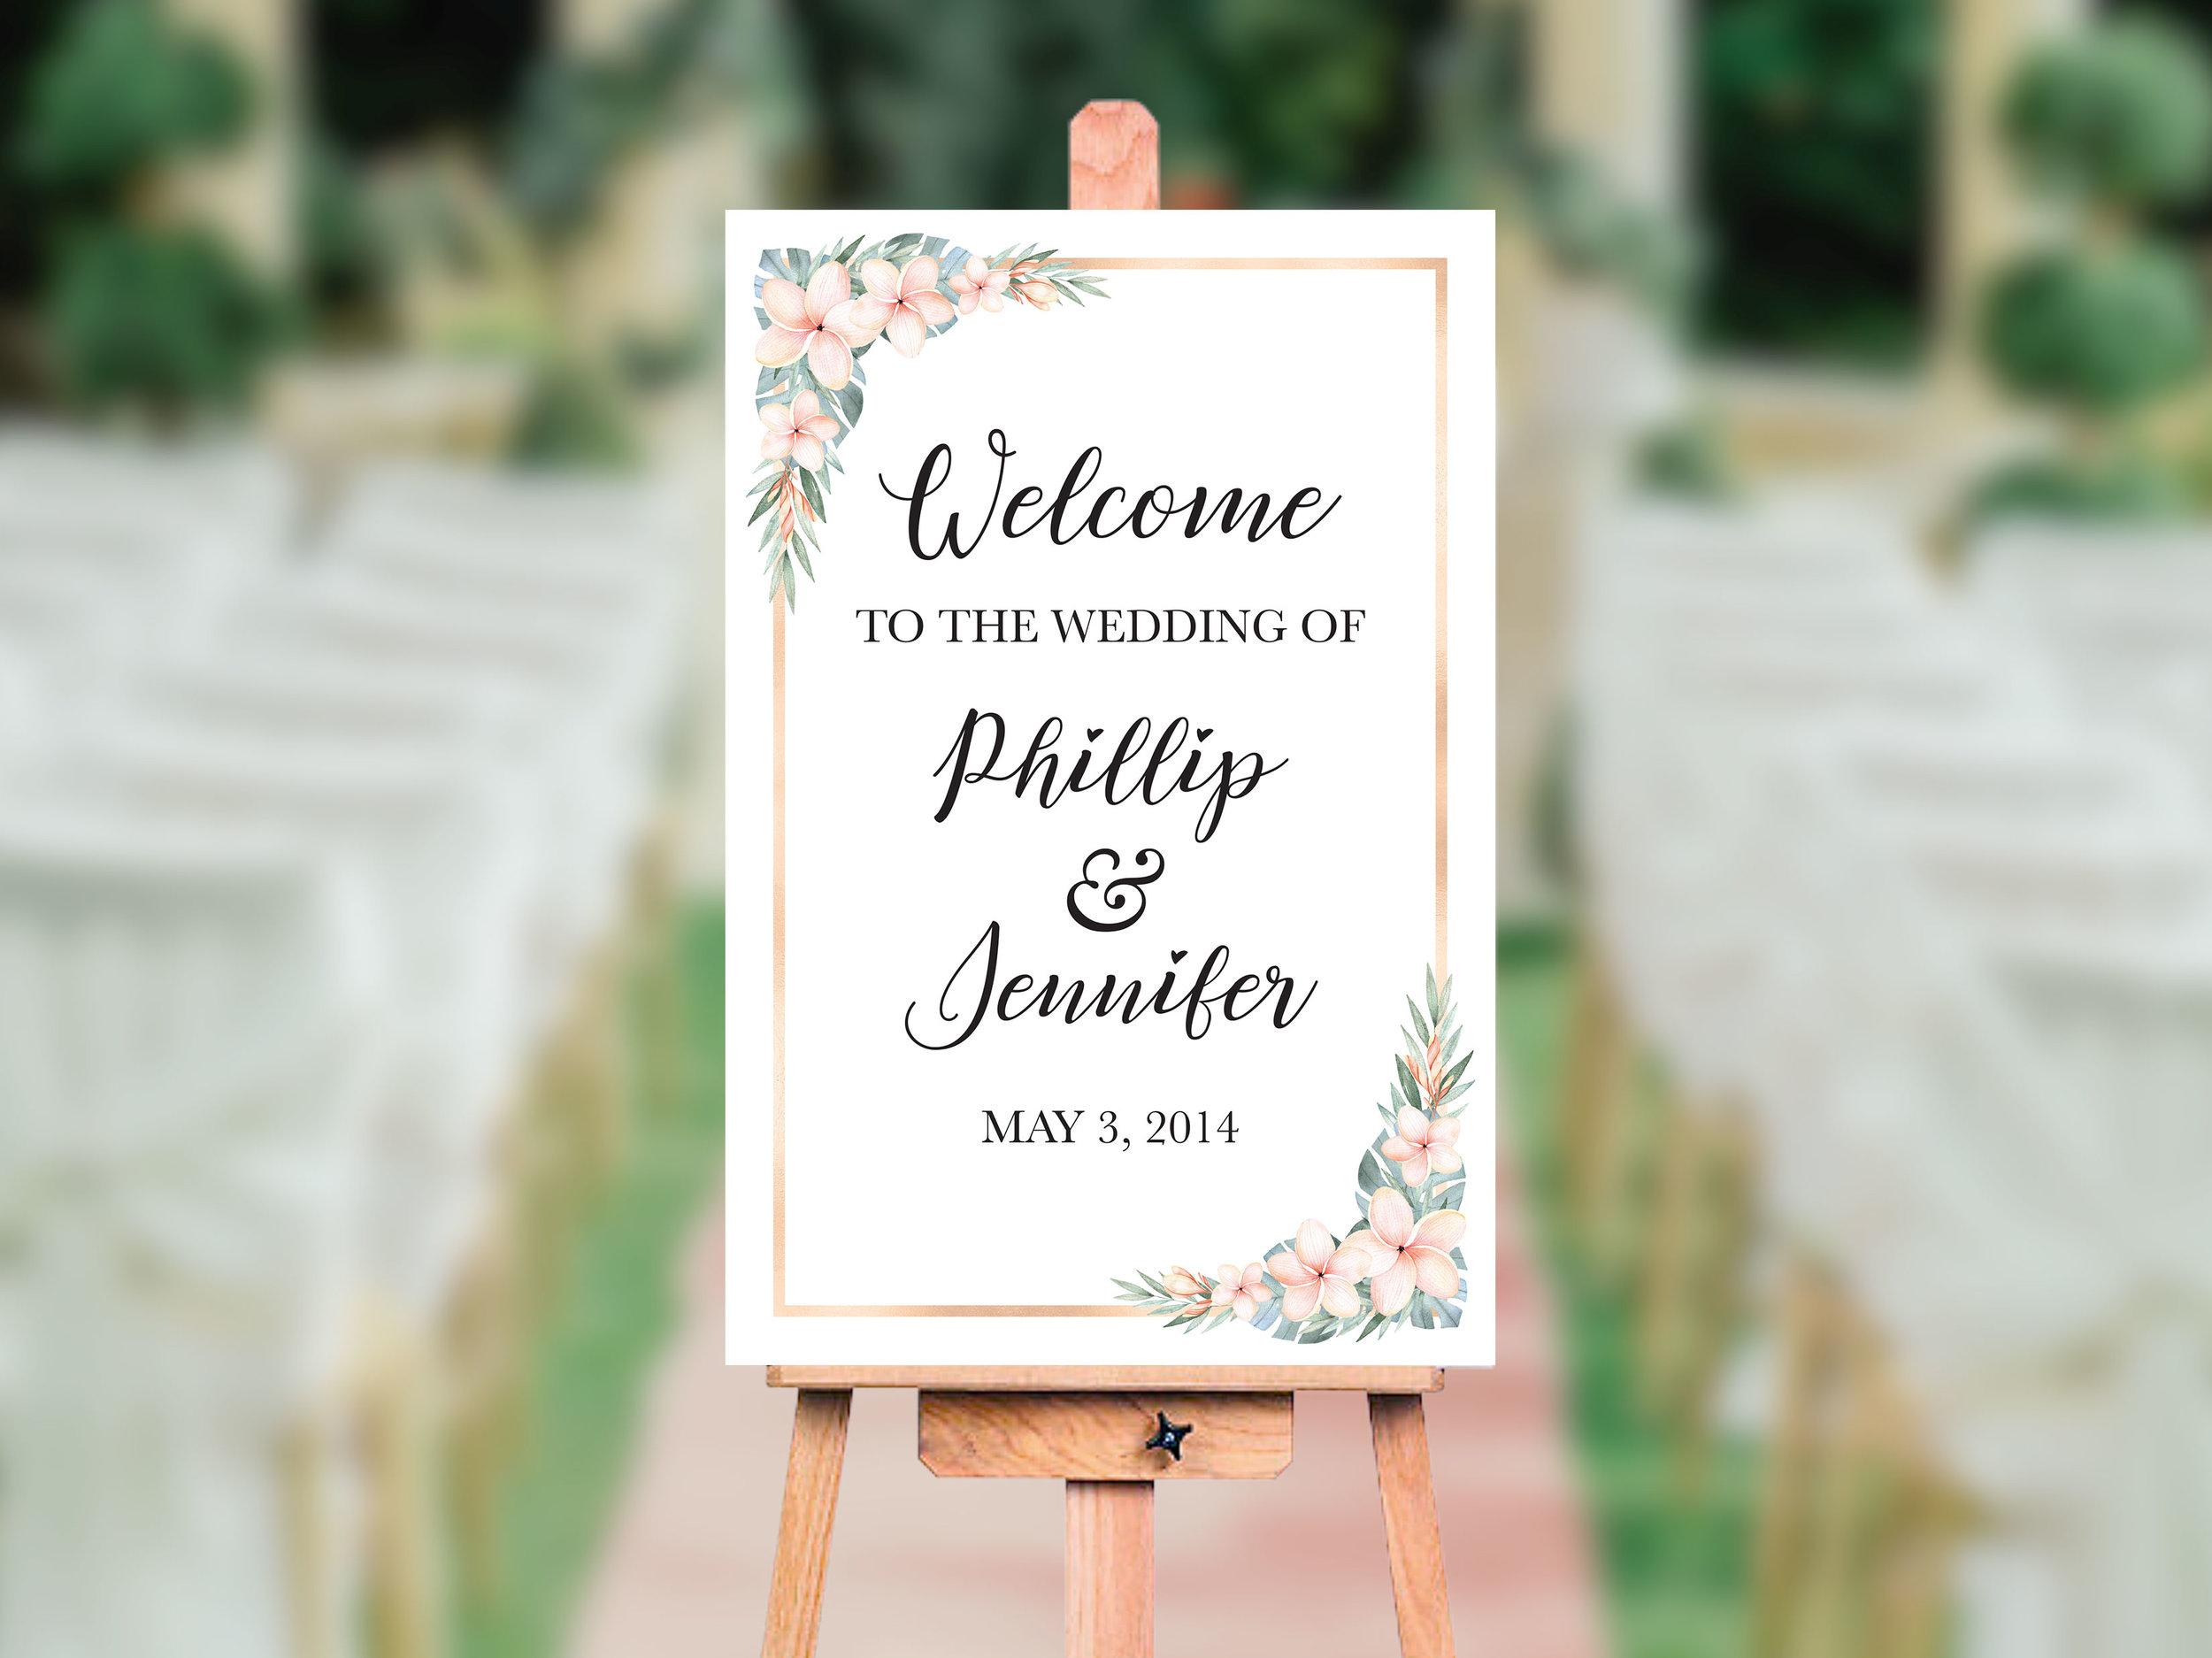 Wedding Welcome Sign (24 x 36)